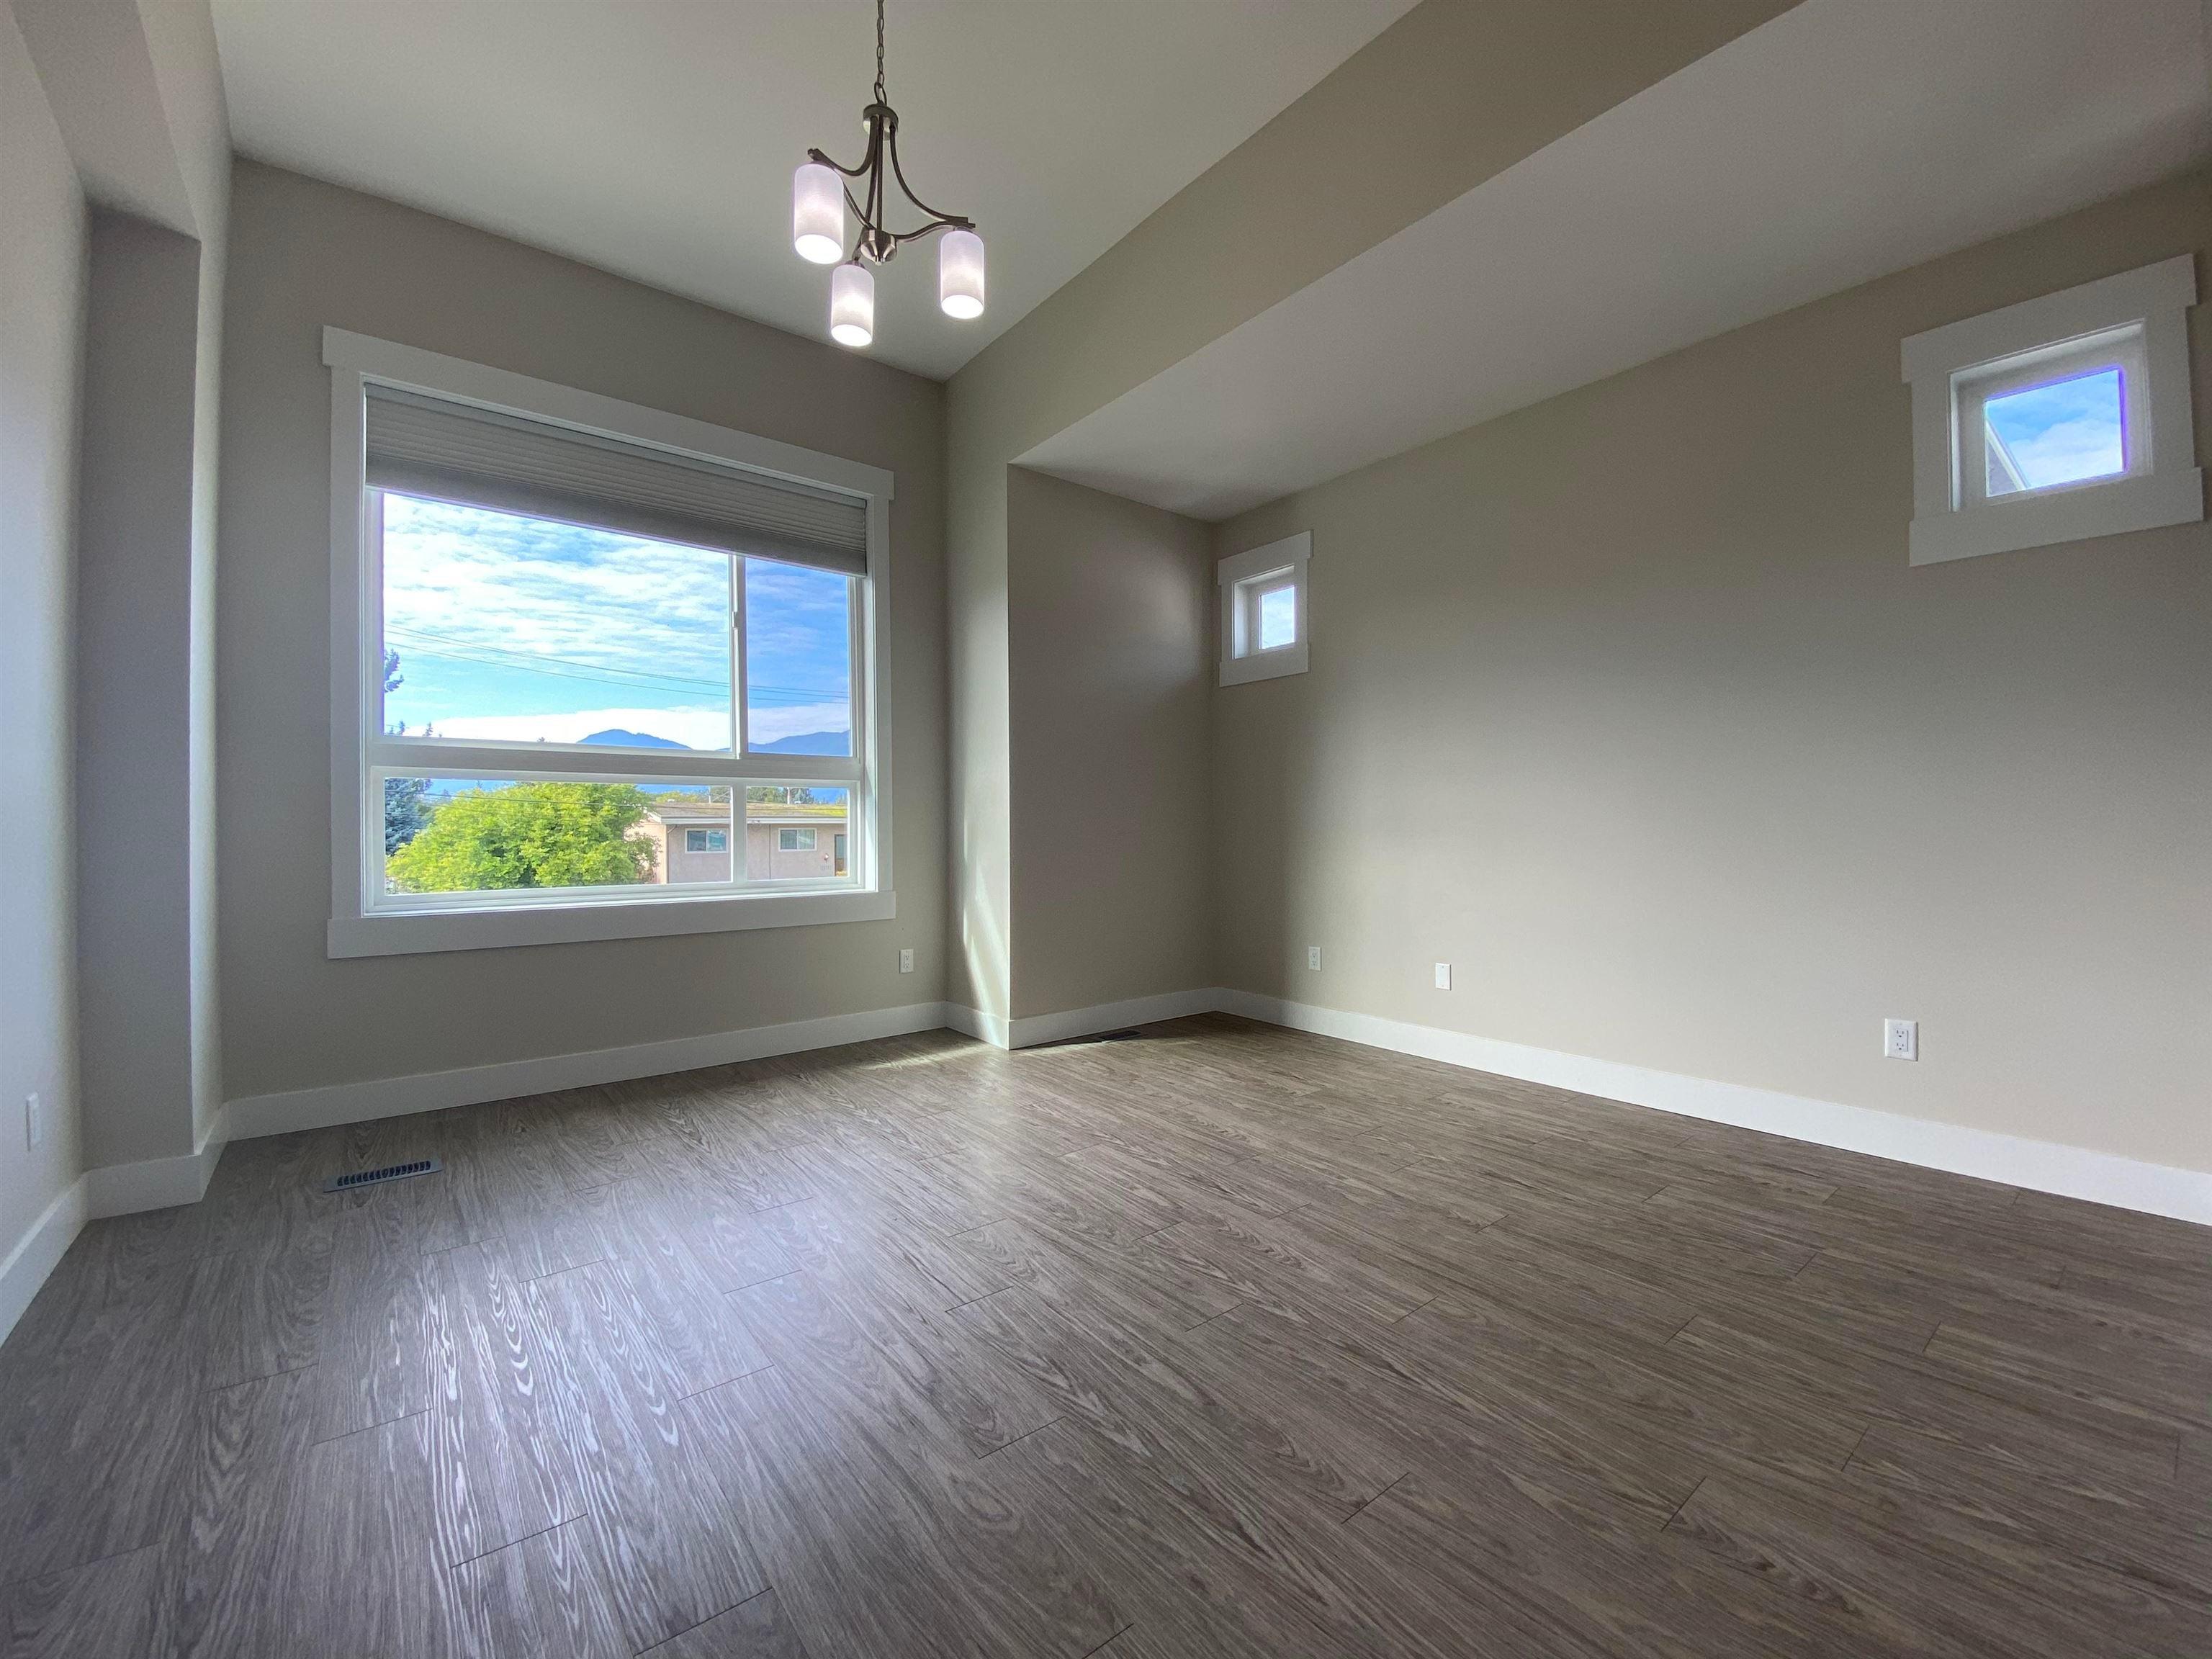 10144 KILLARNEY DRIVE - Fairfield Island House/Single Family for sale, 5 Bedrooms (R2625716) - #21